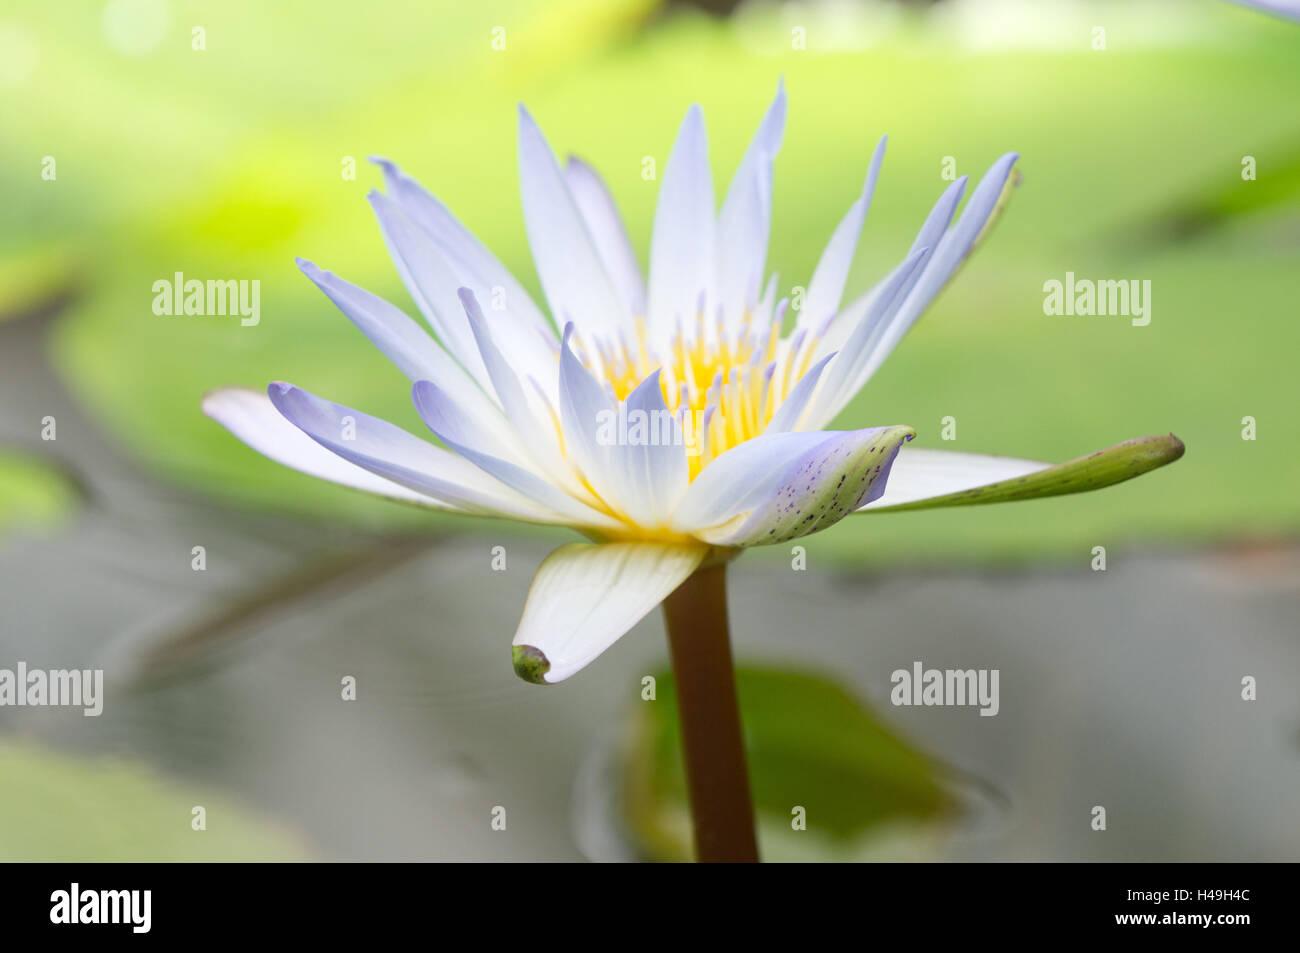 White Egyptian Lotus Blossom Close Up Stock Photo 123142220 Alamy